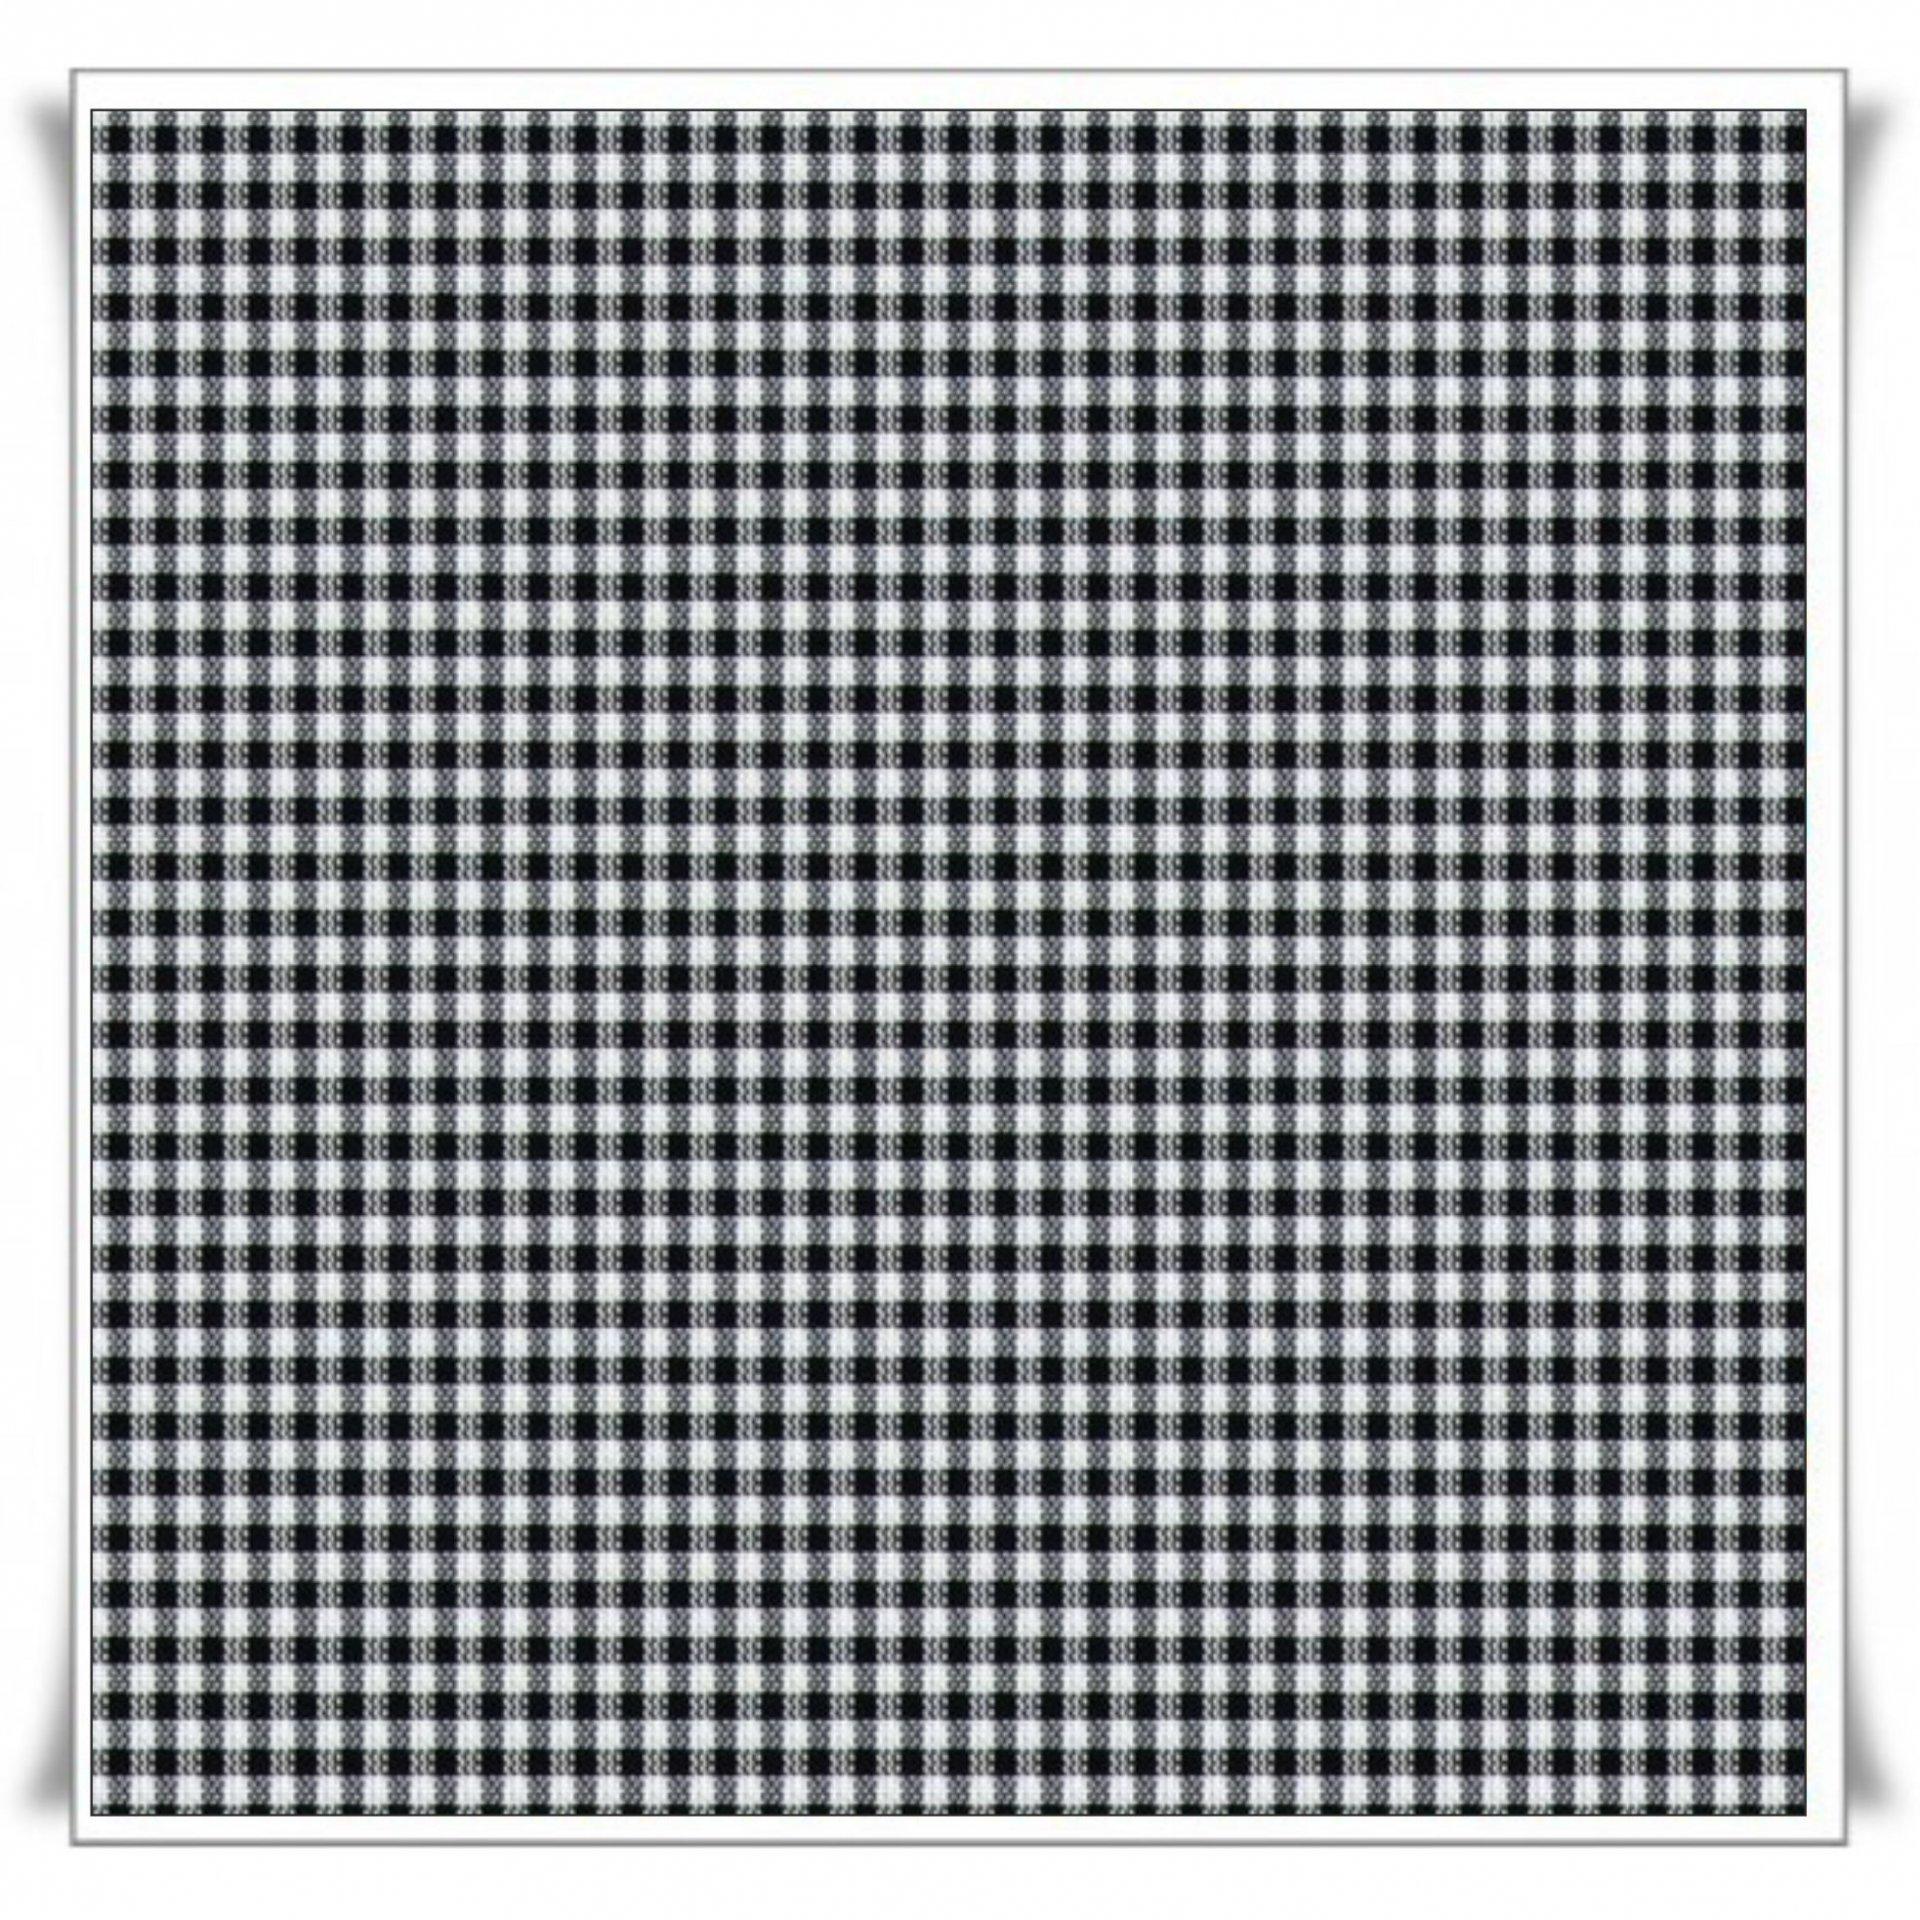 106 - VICHY NEGRO – 0,2 CM.jpg